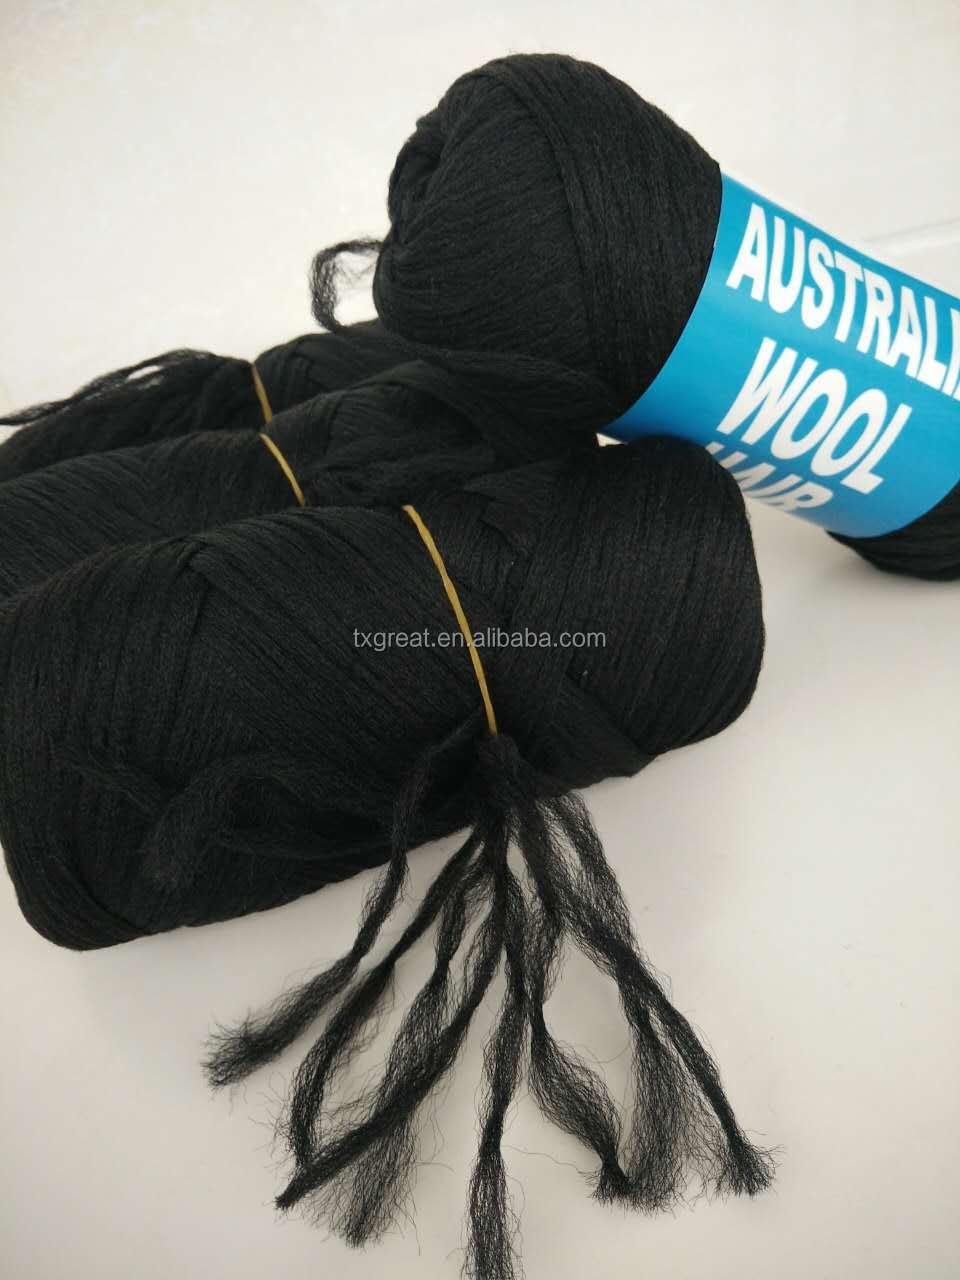 Australia Wool Hair 100%acrylic Hand &machine Knitting Yarn